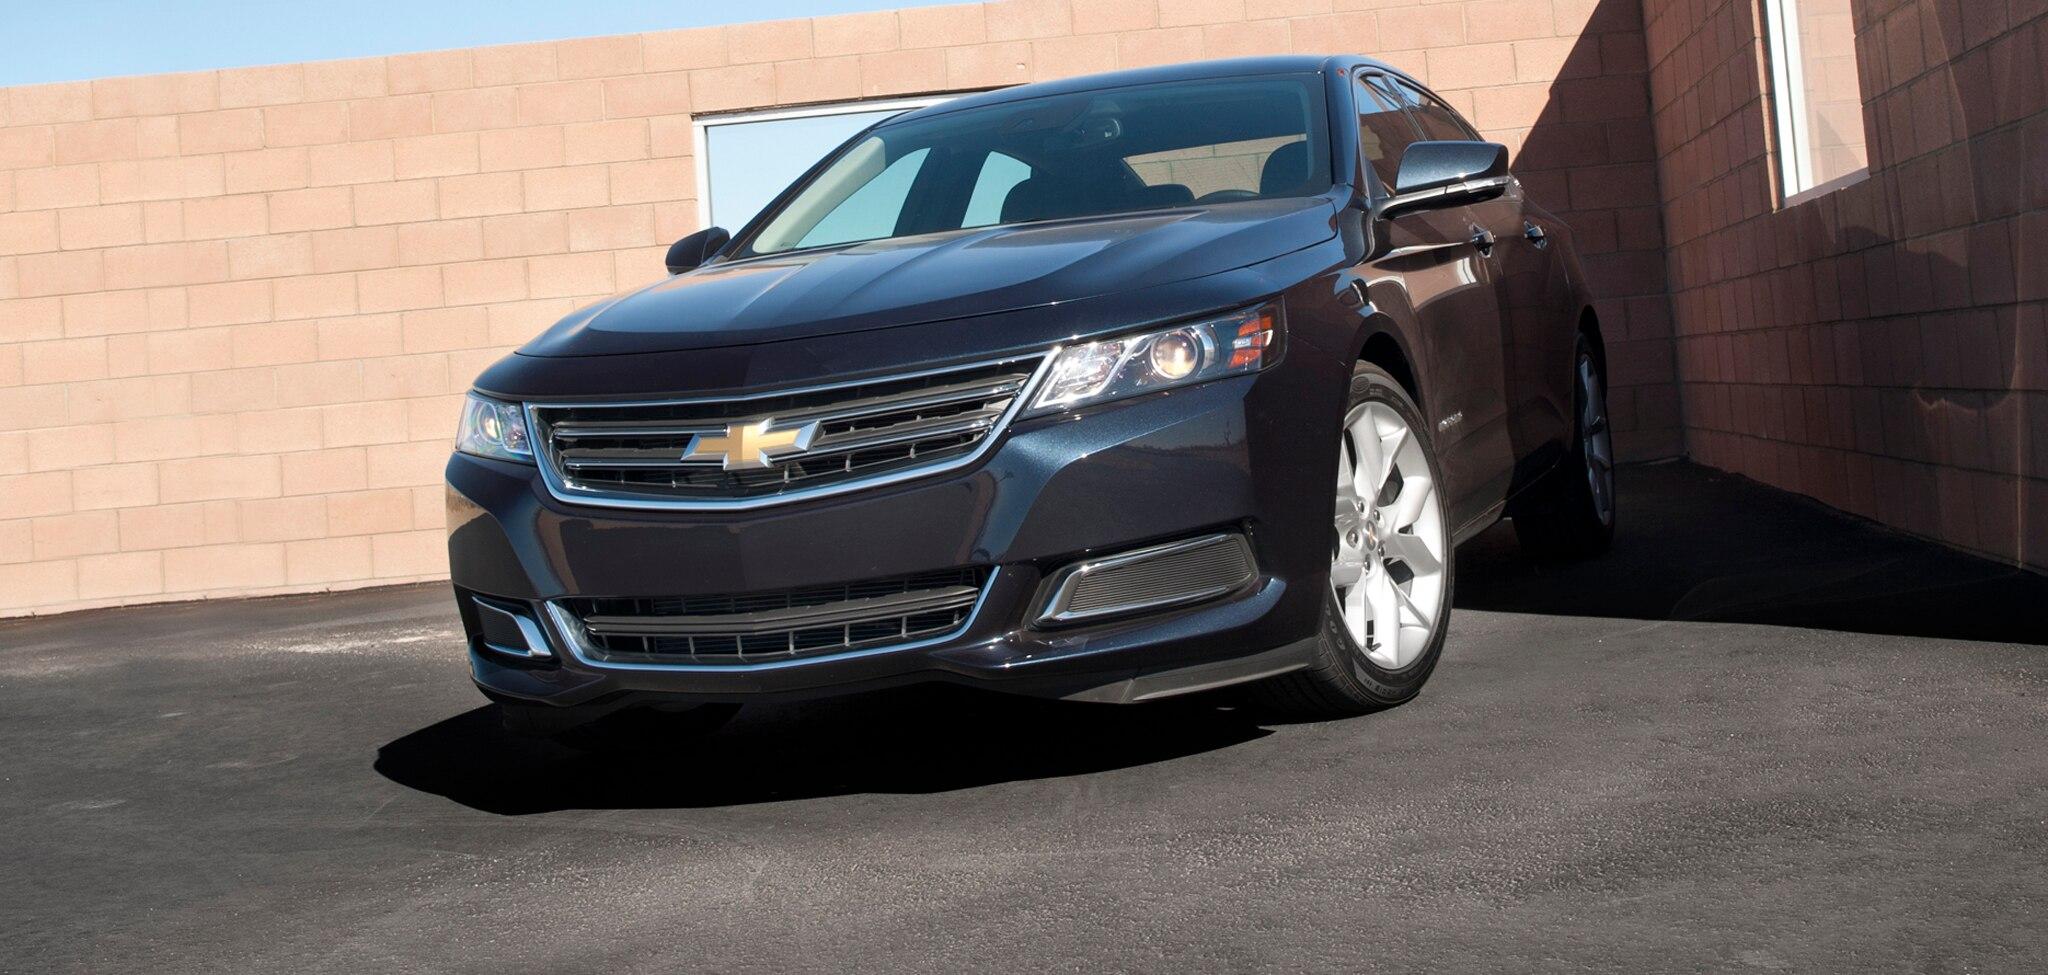 cng fueled 2015 chevrolet impala introduced. Black Bedroom Furniture Sets. Home Design Ideas